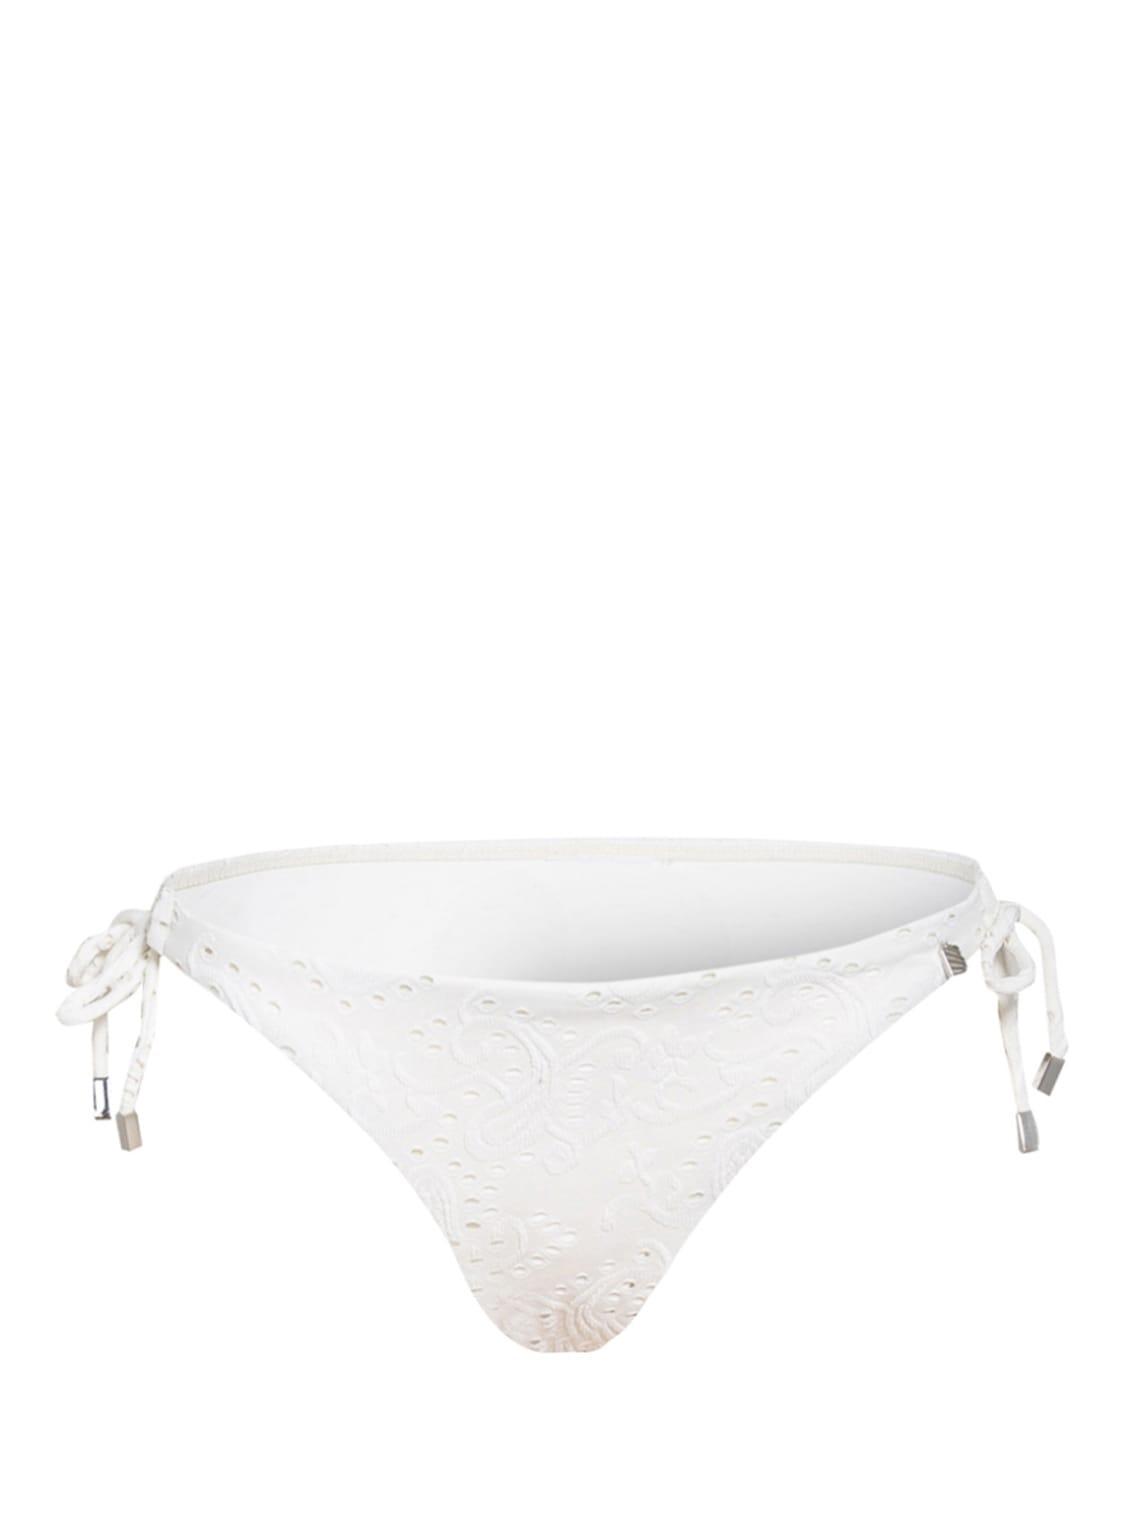 Image of Beachlife Bikini-Hose Blanc De Blanc weiss